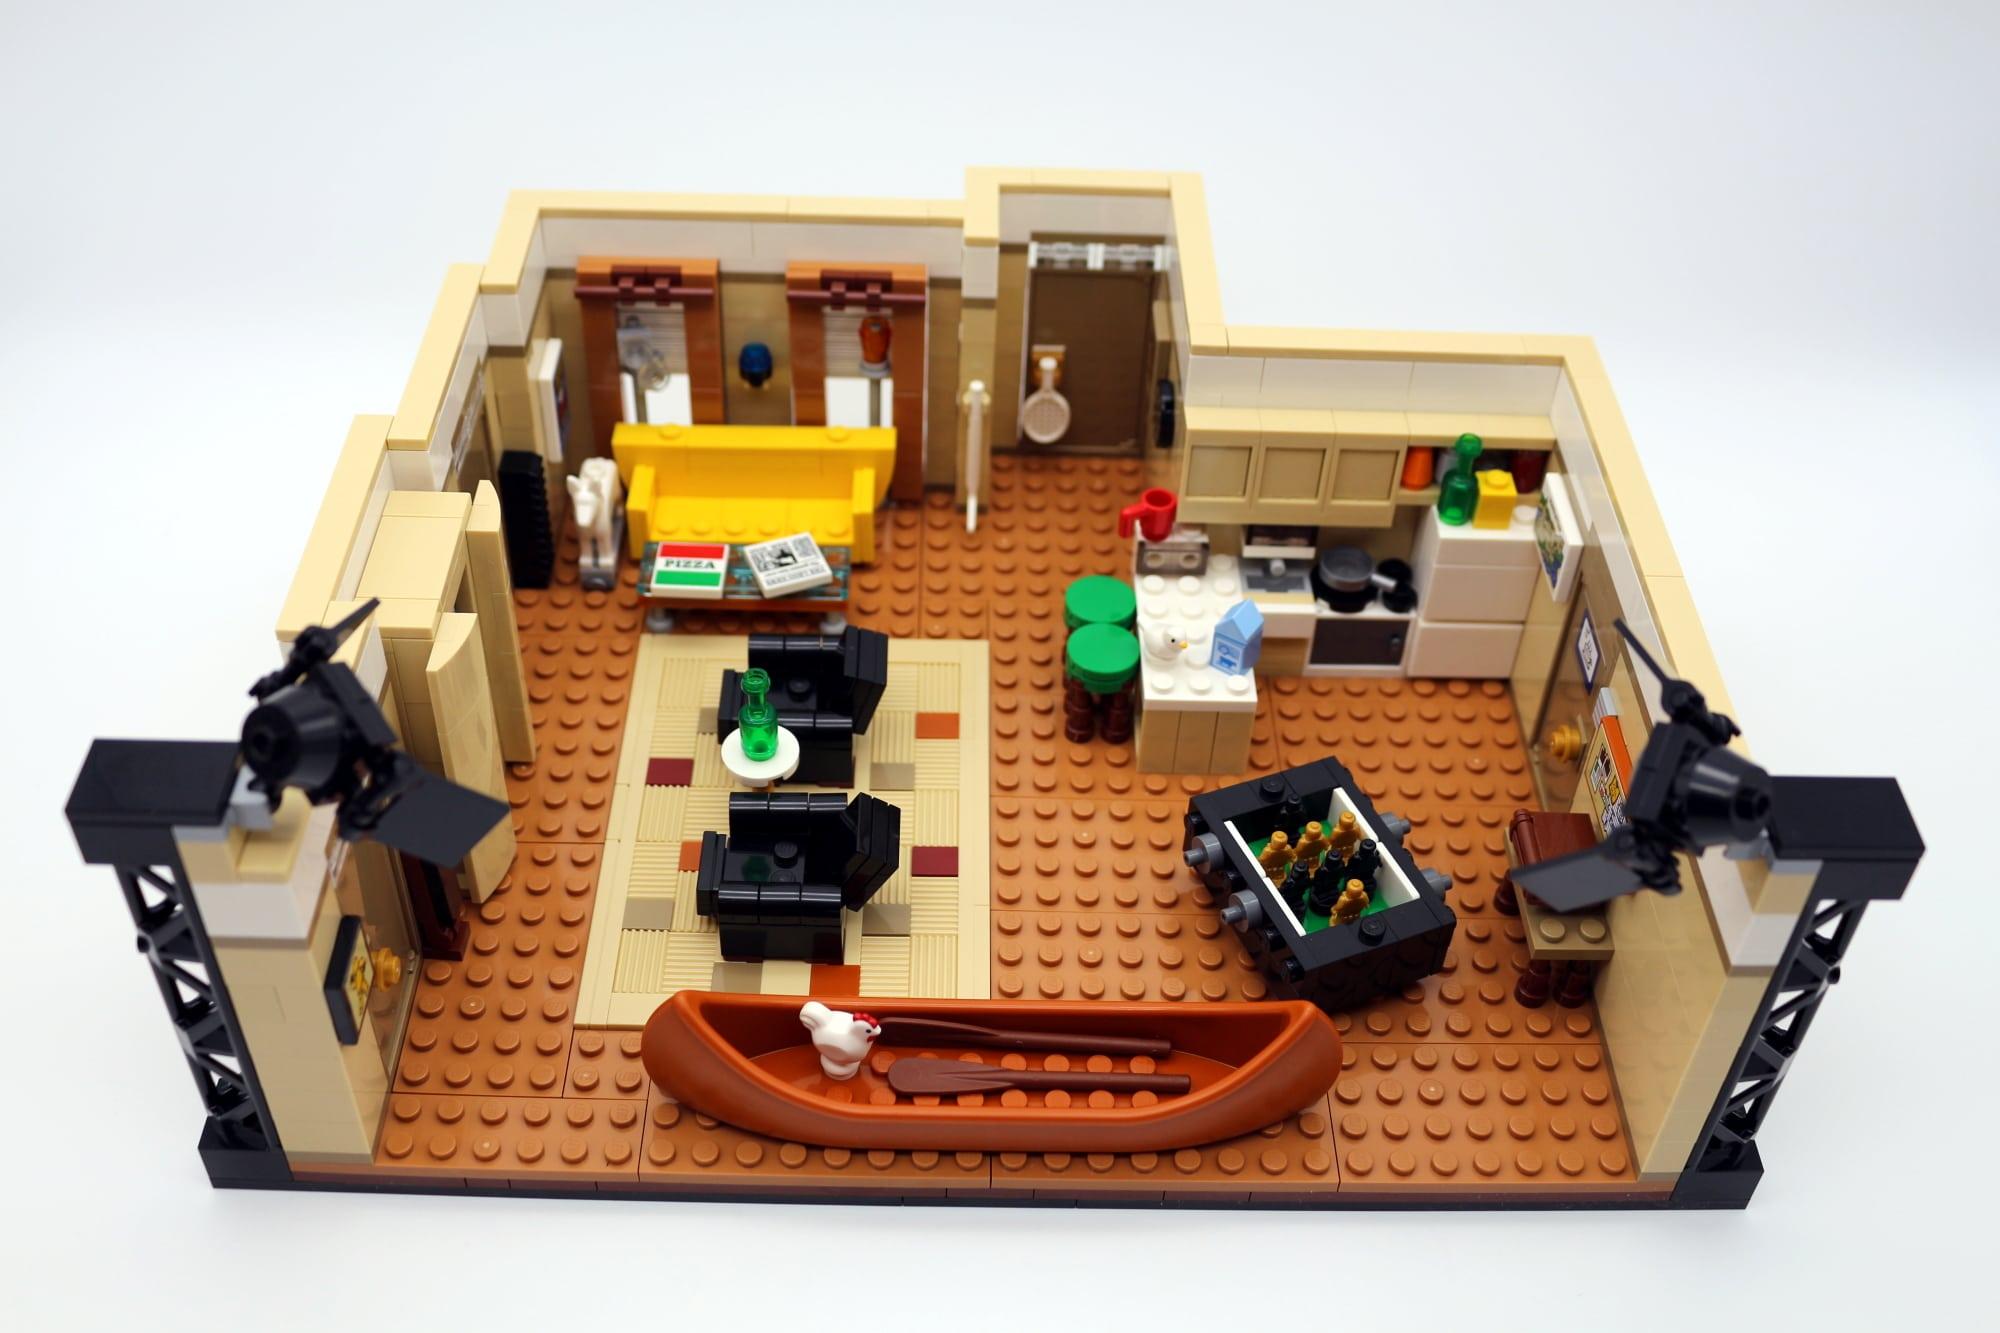 LEGO Friends 10292 The Friends Apartments 23